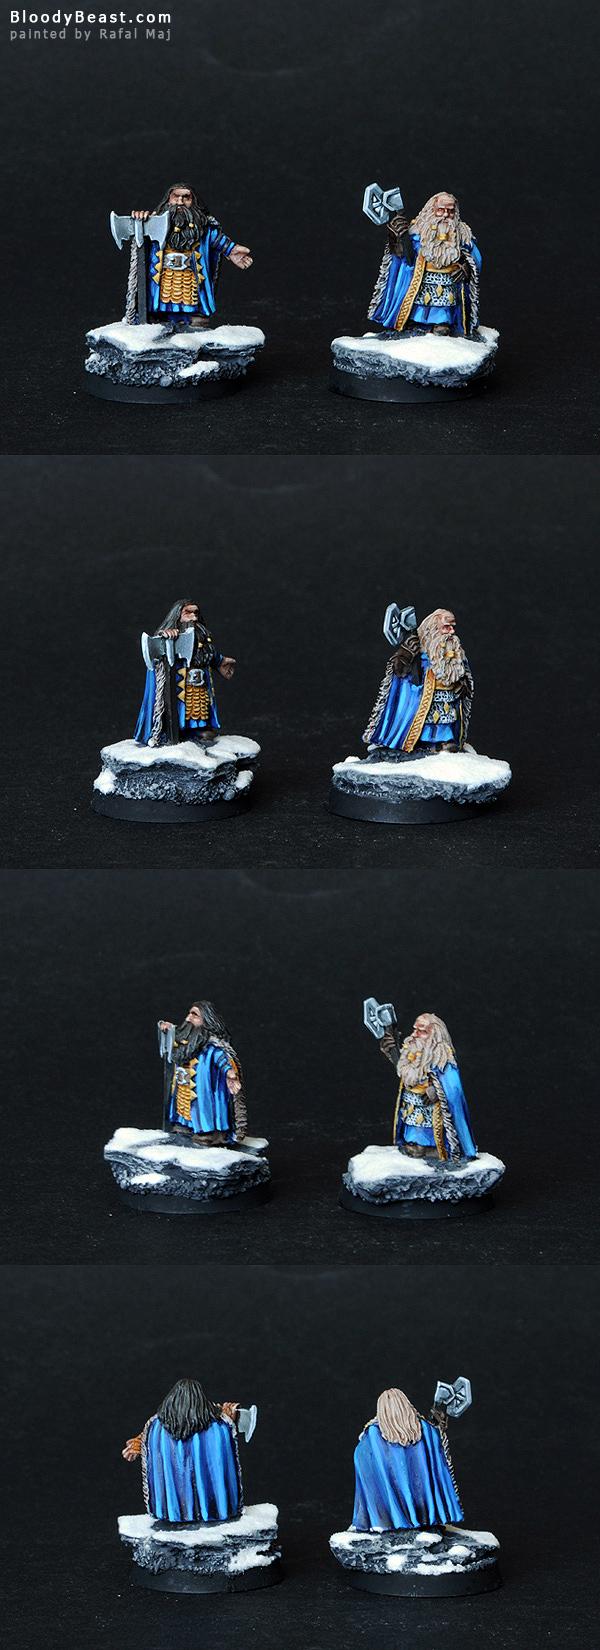 Dwarf Kings painted by Rafal Maj (BloodyBeast.com)